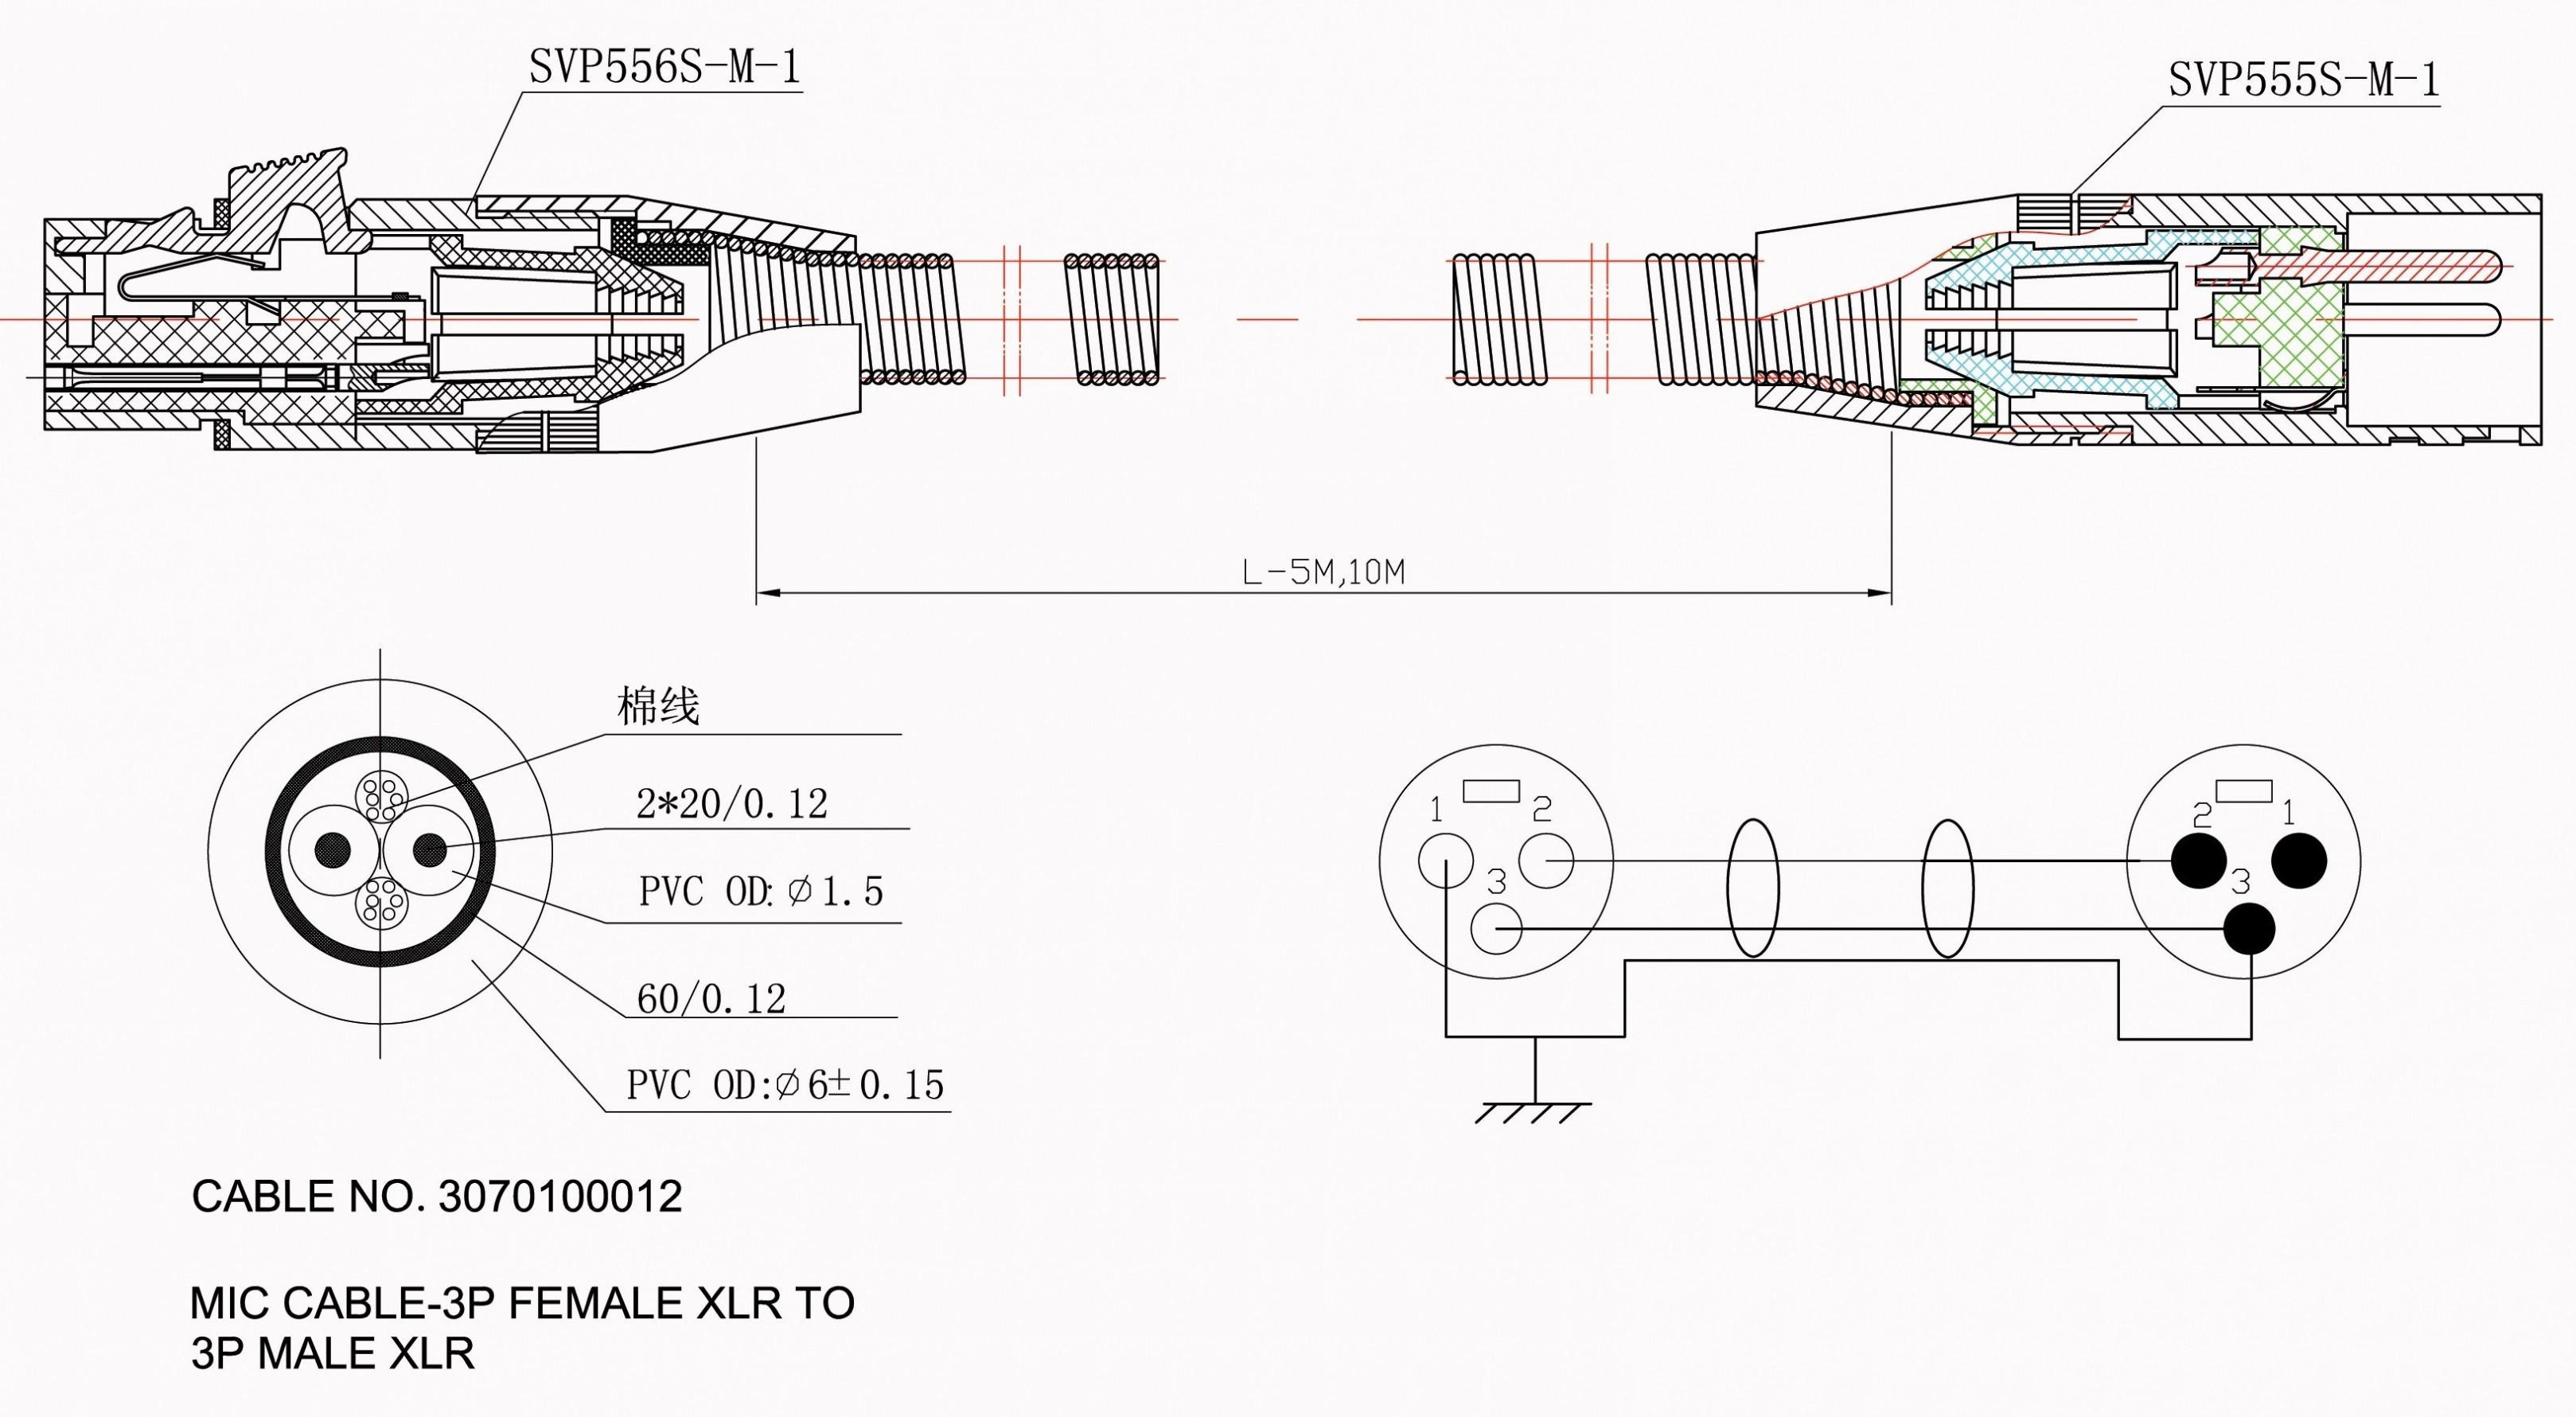 2000 S10 Tail Light Wiring Diagram 2000 S10 Tail Light Wiring ... Wiring Diagram S Tailligh on